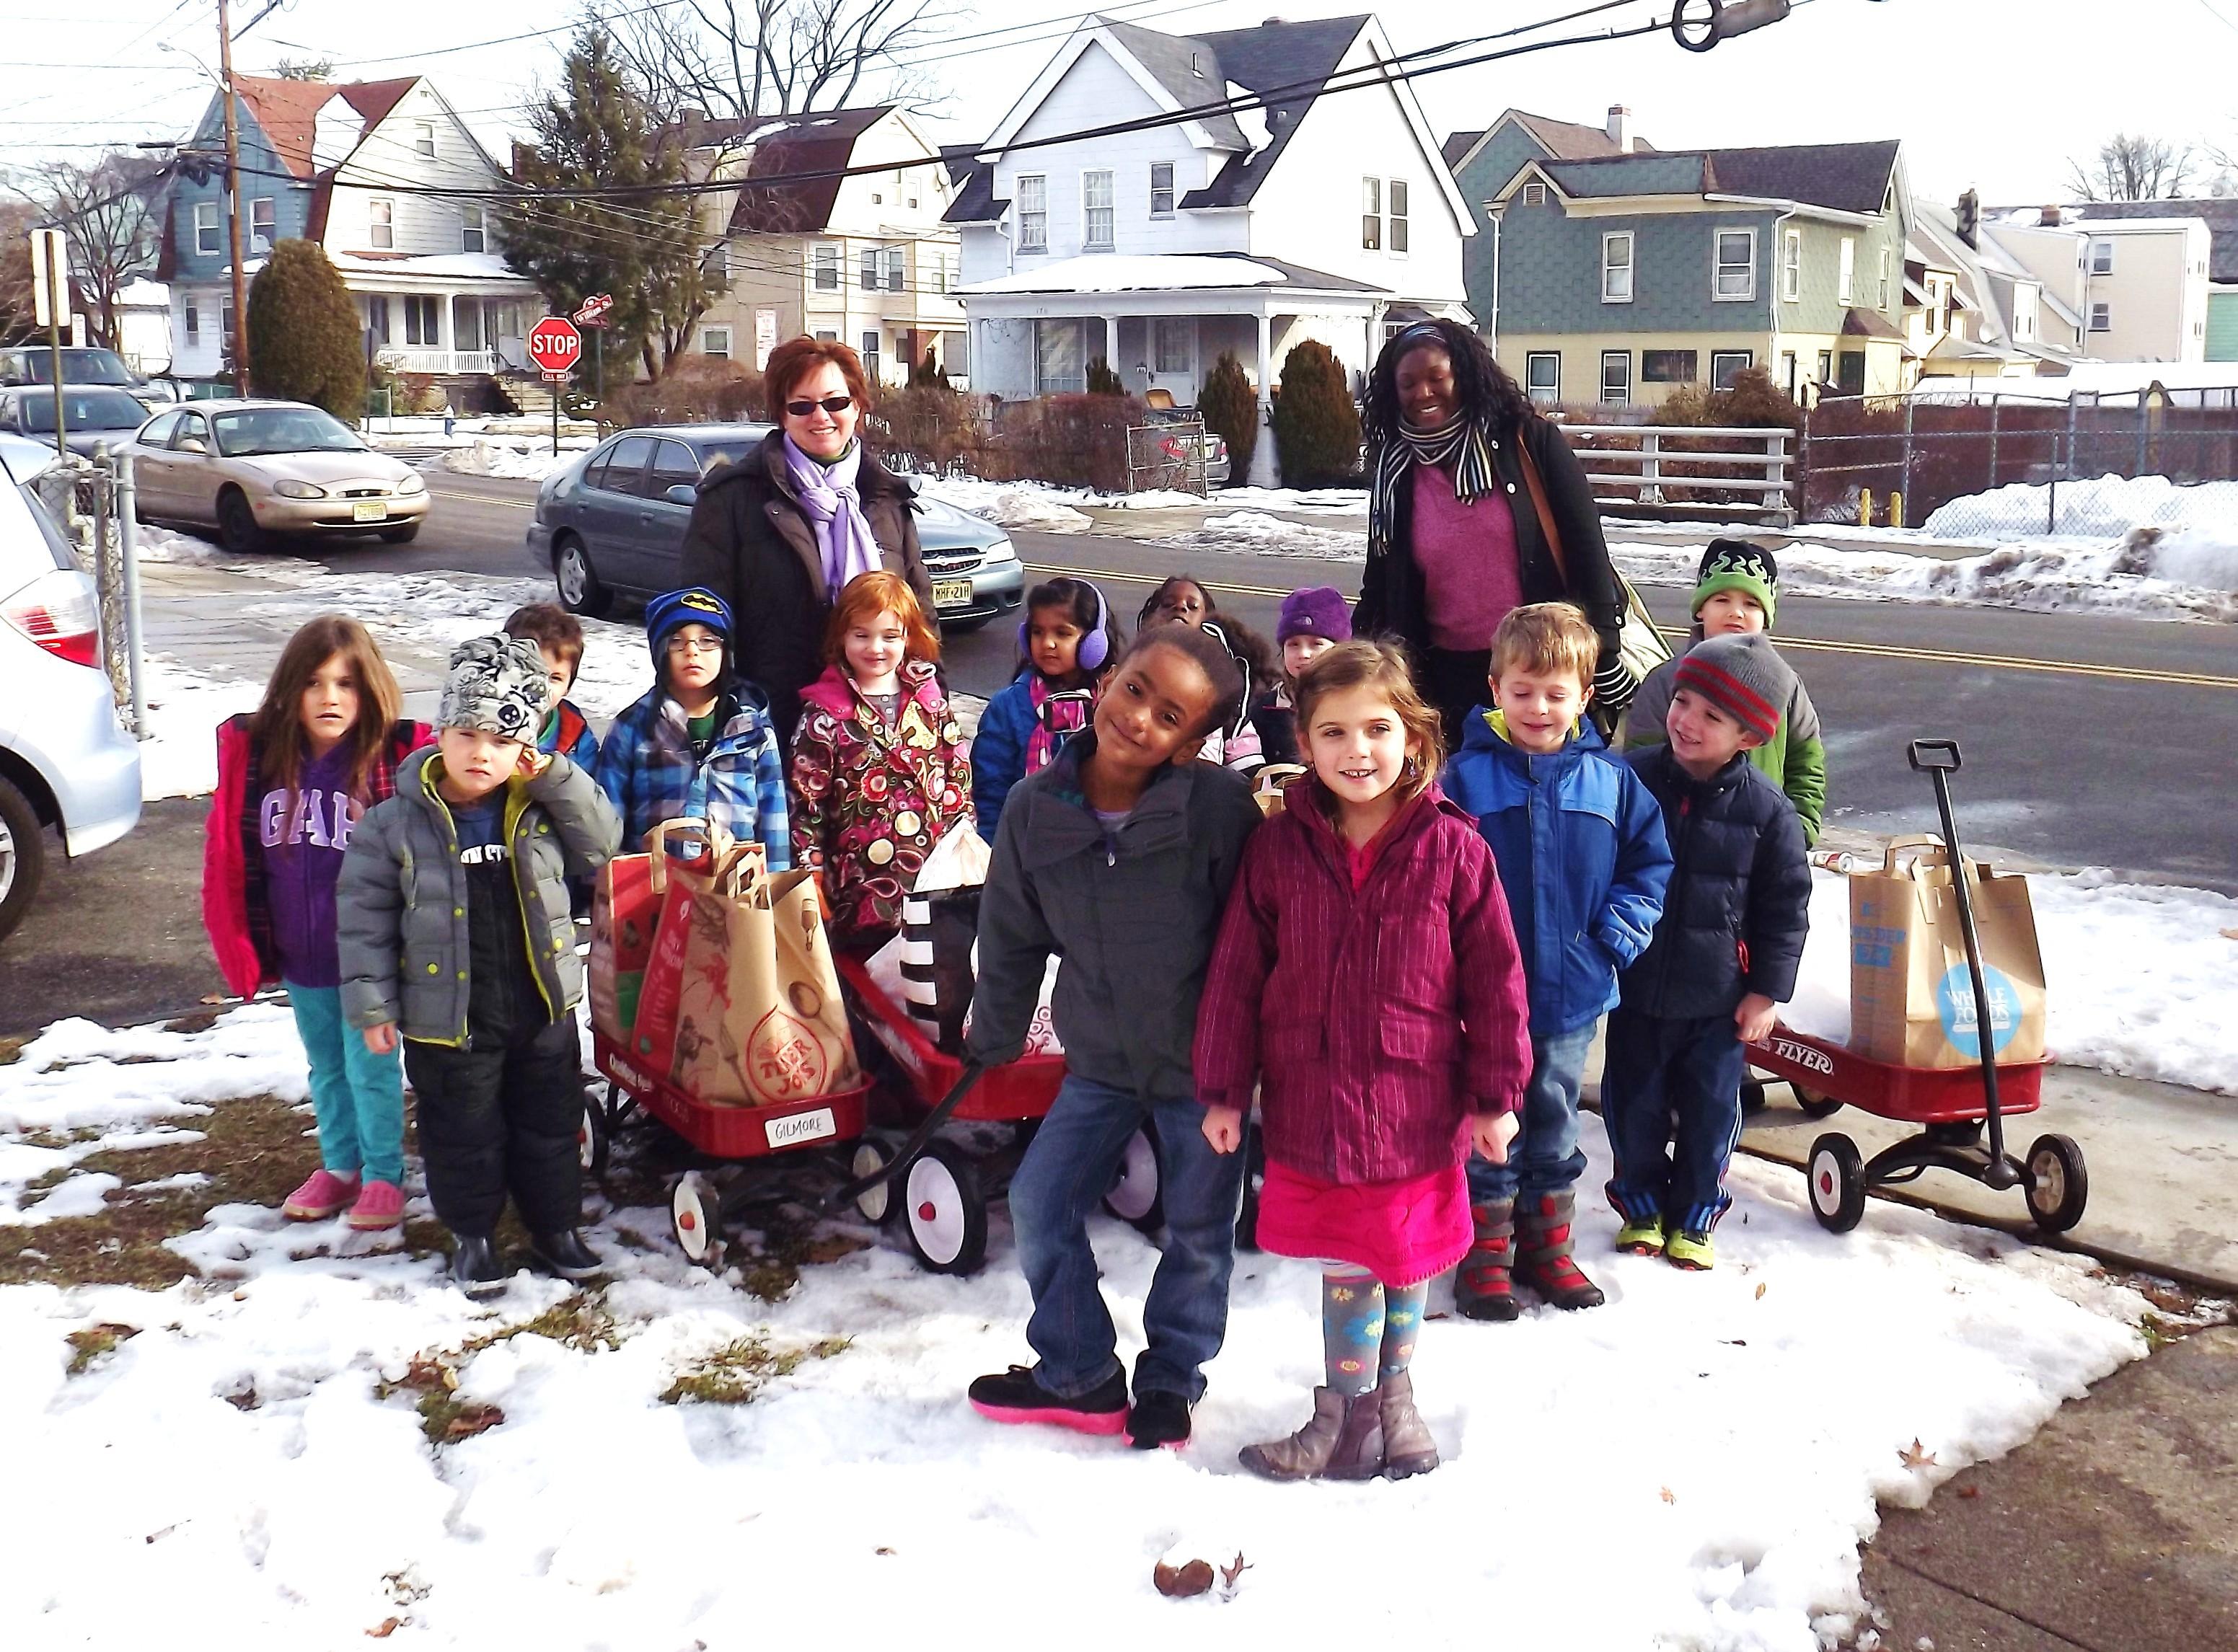 Playhouse nursery school visits holy trinity west orange for School playhouse